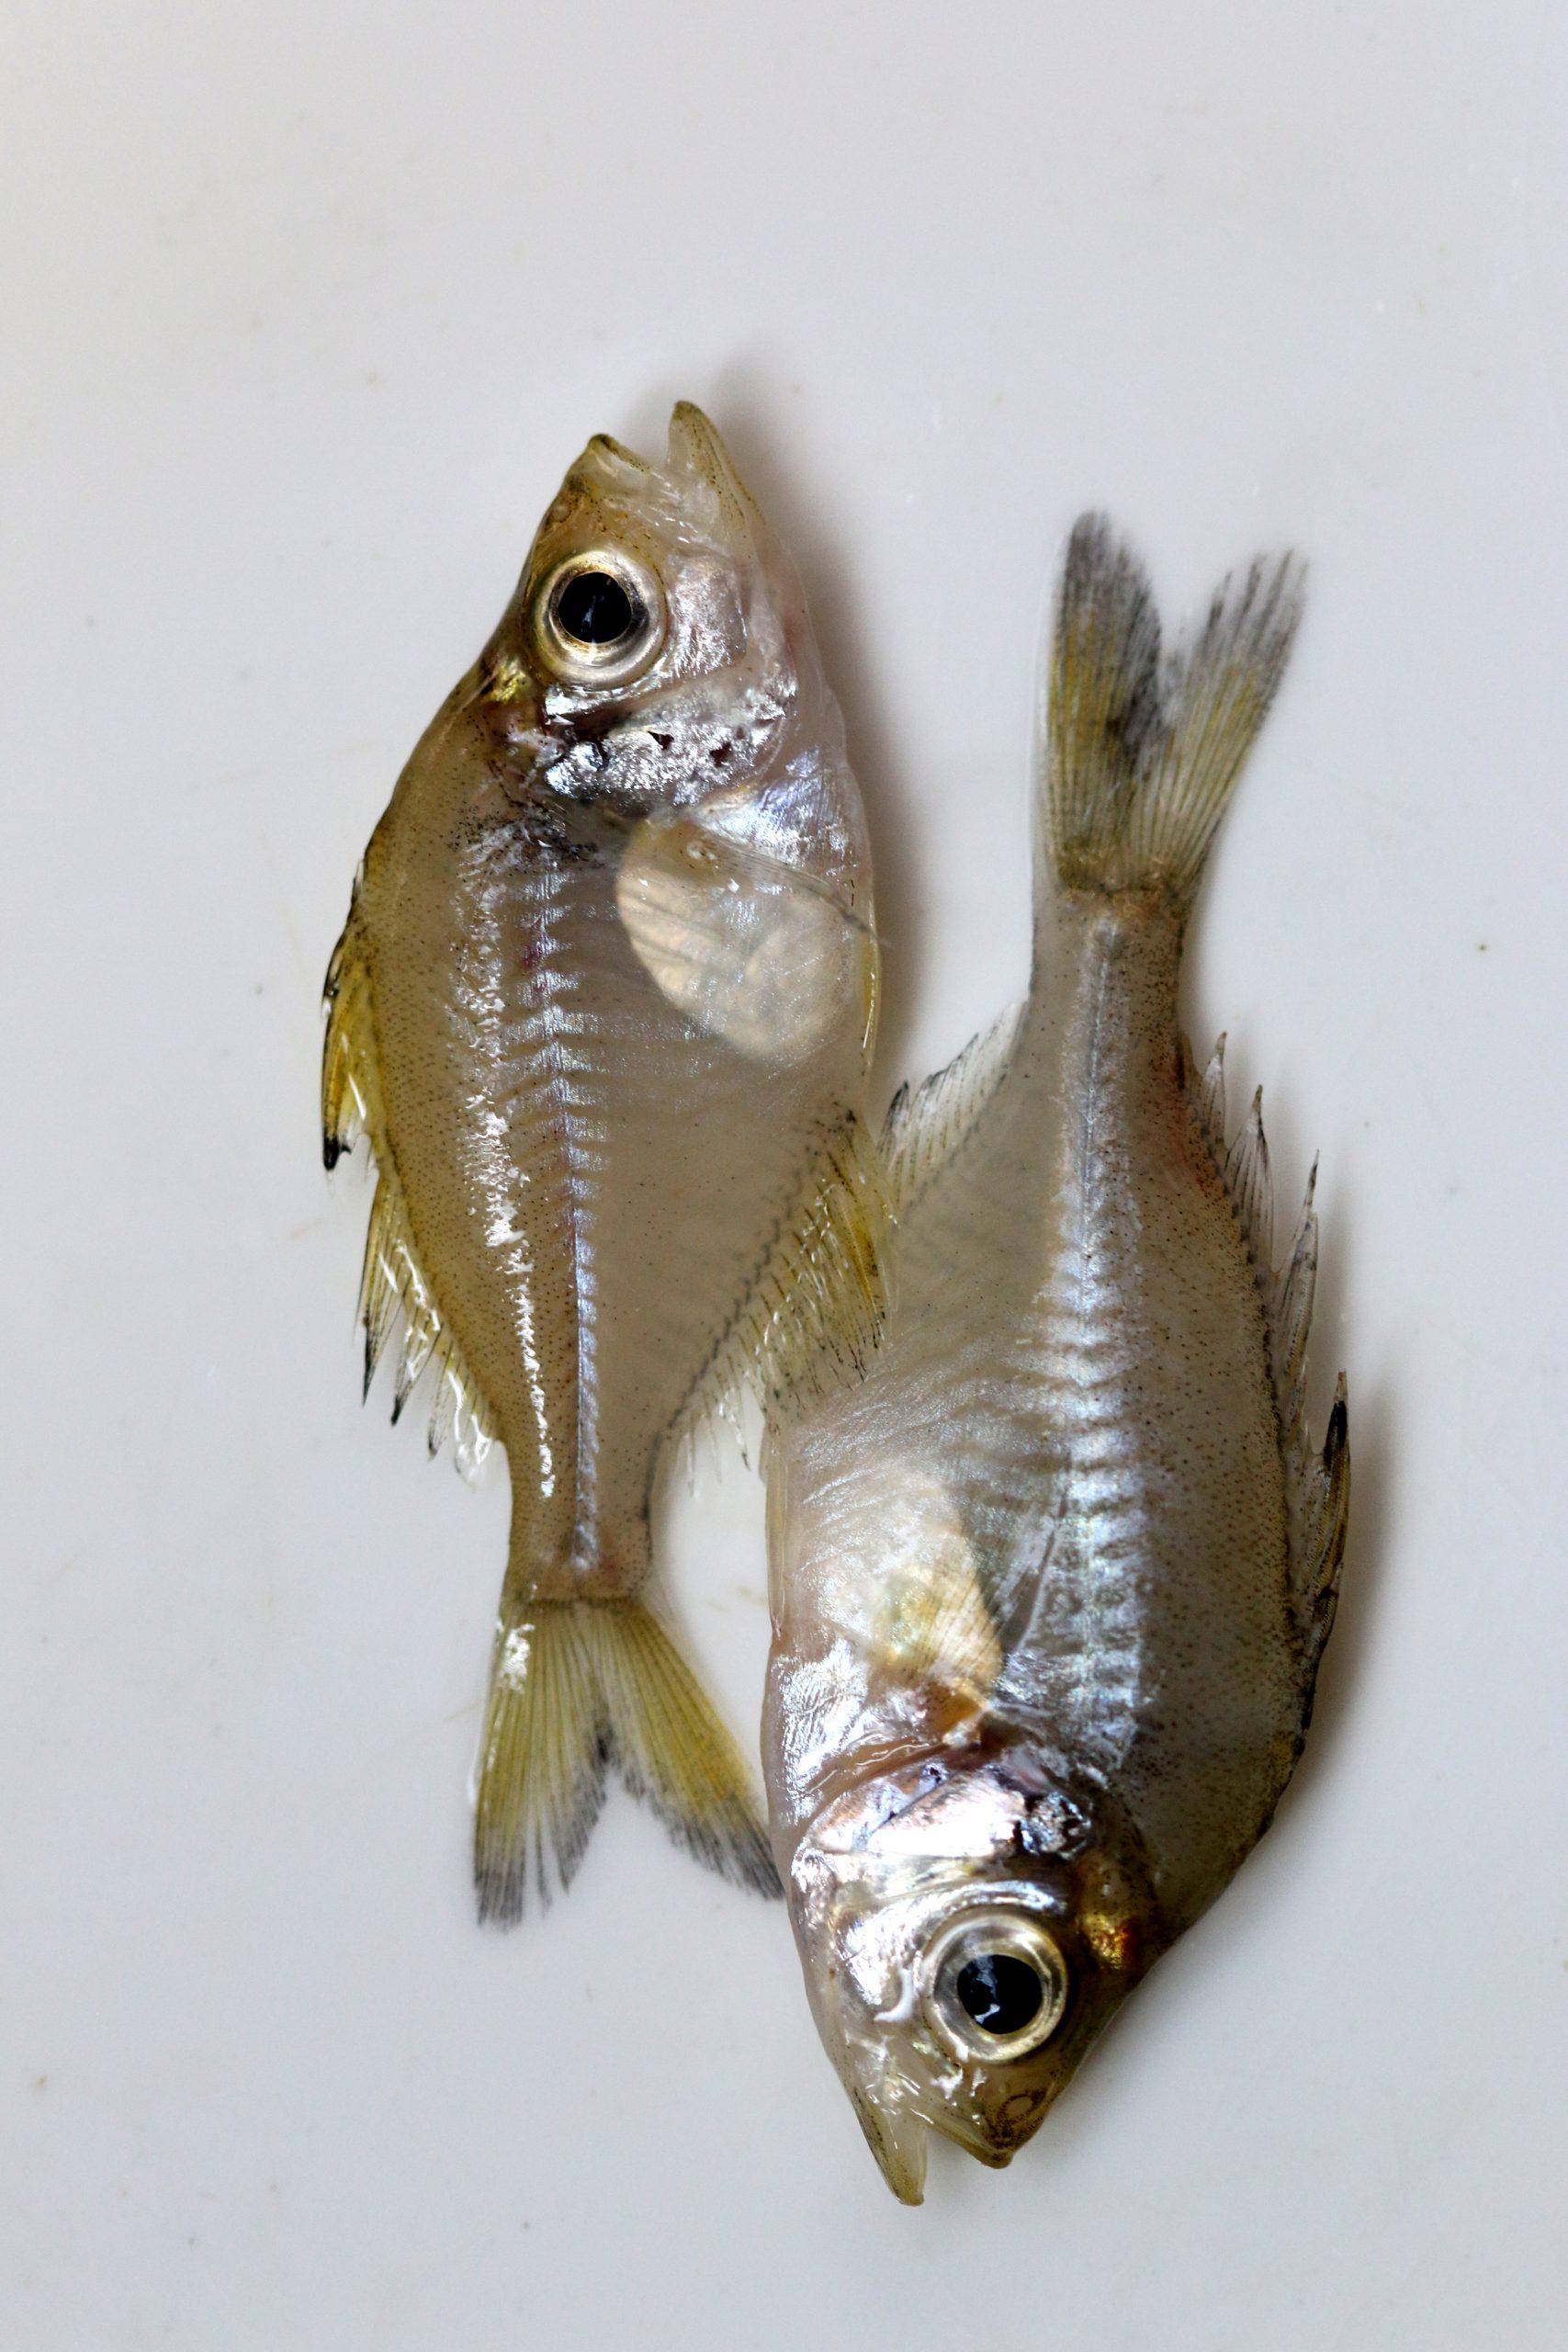 Small Fish on Focus